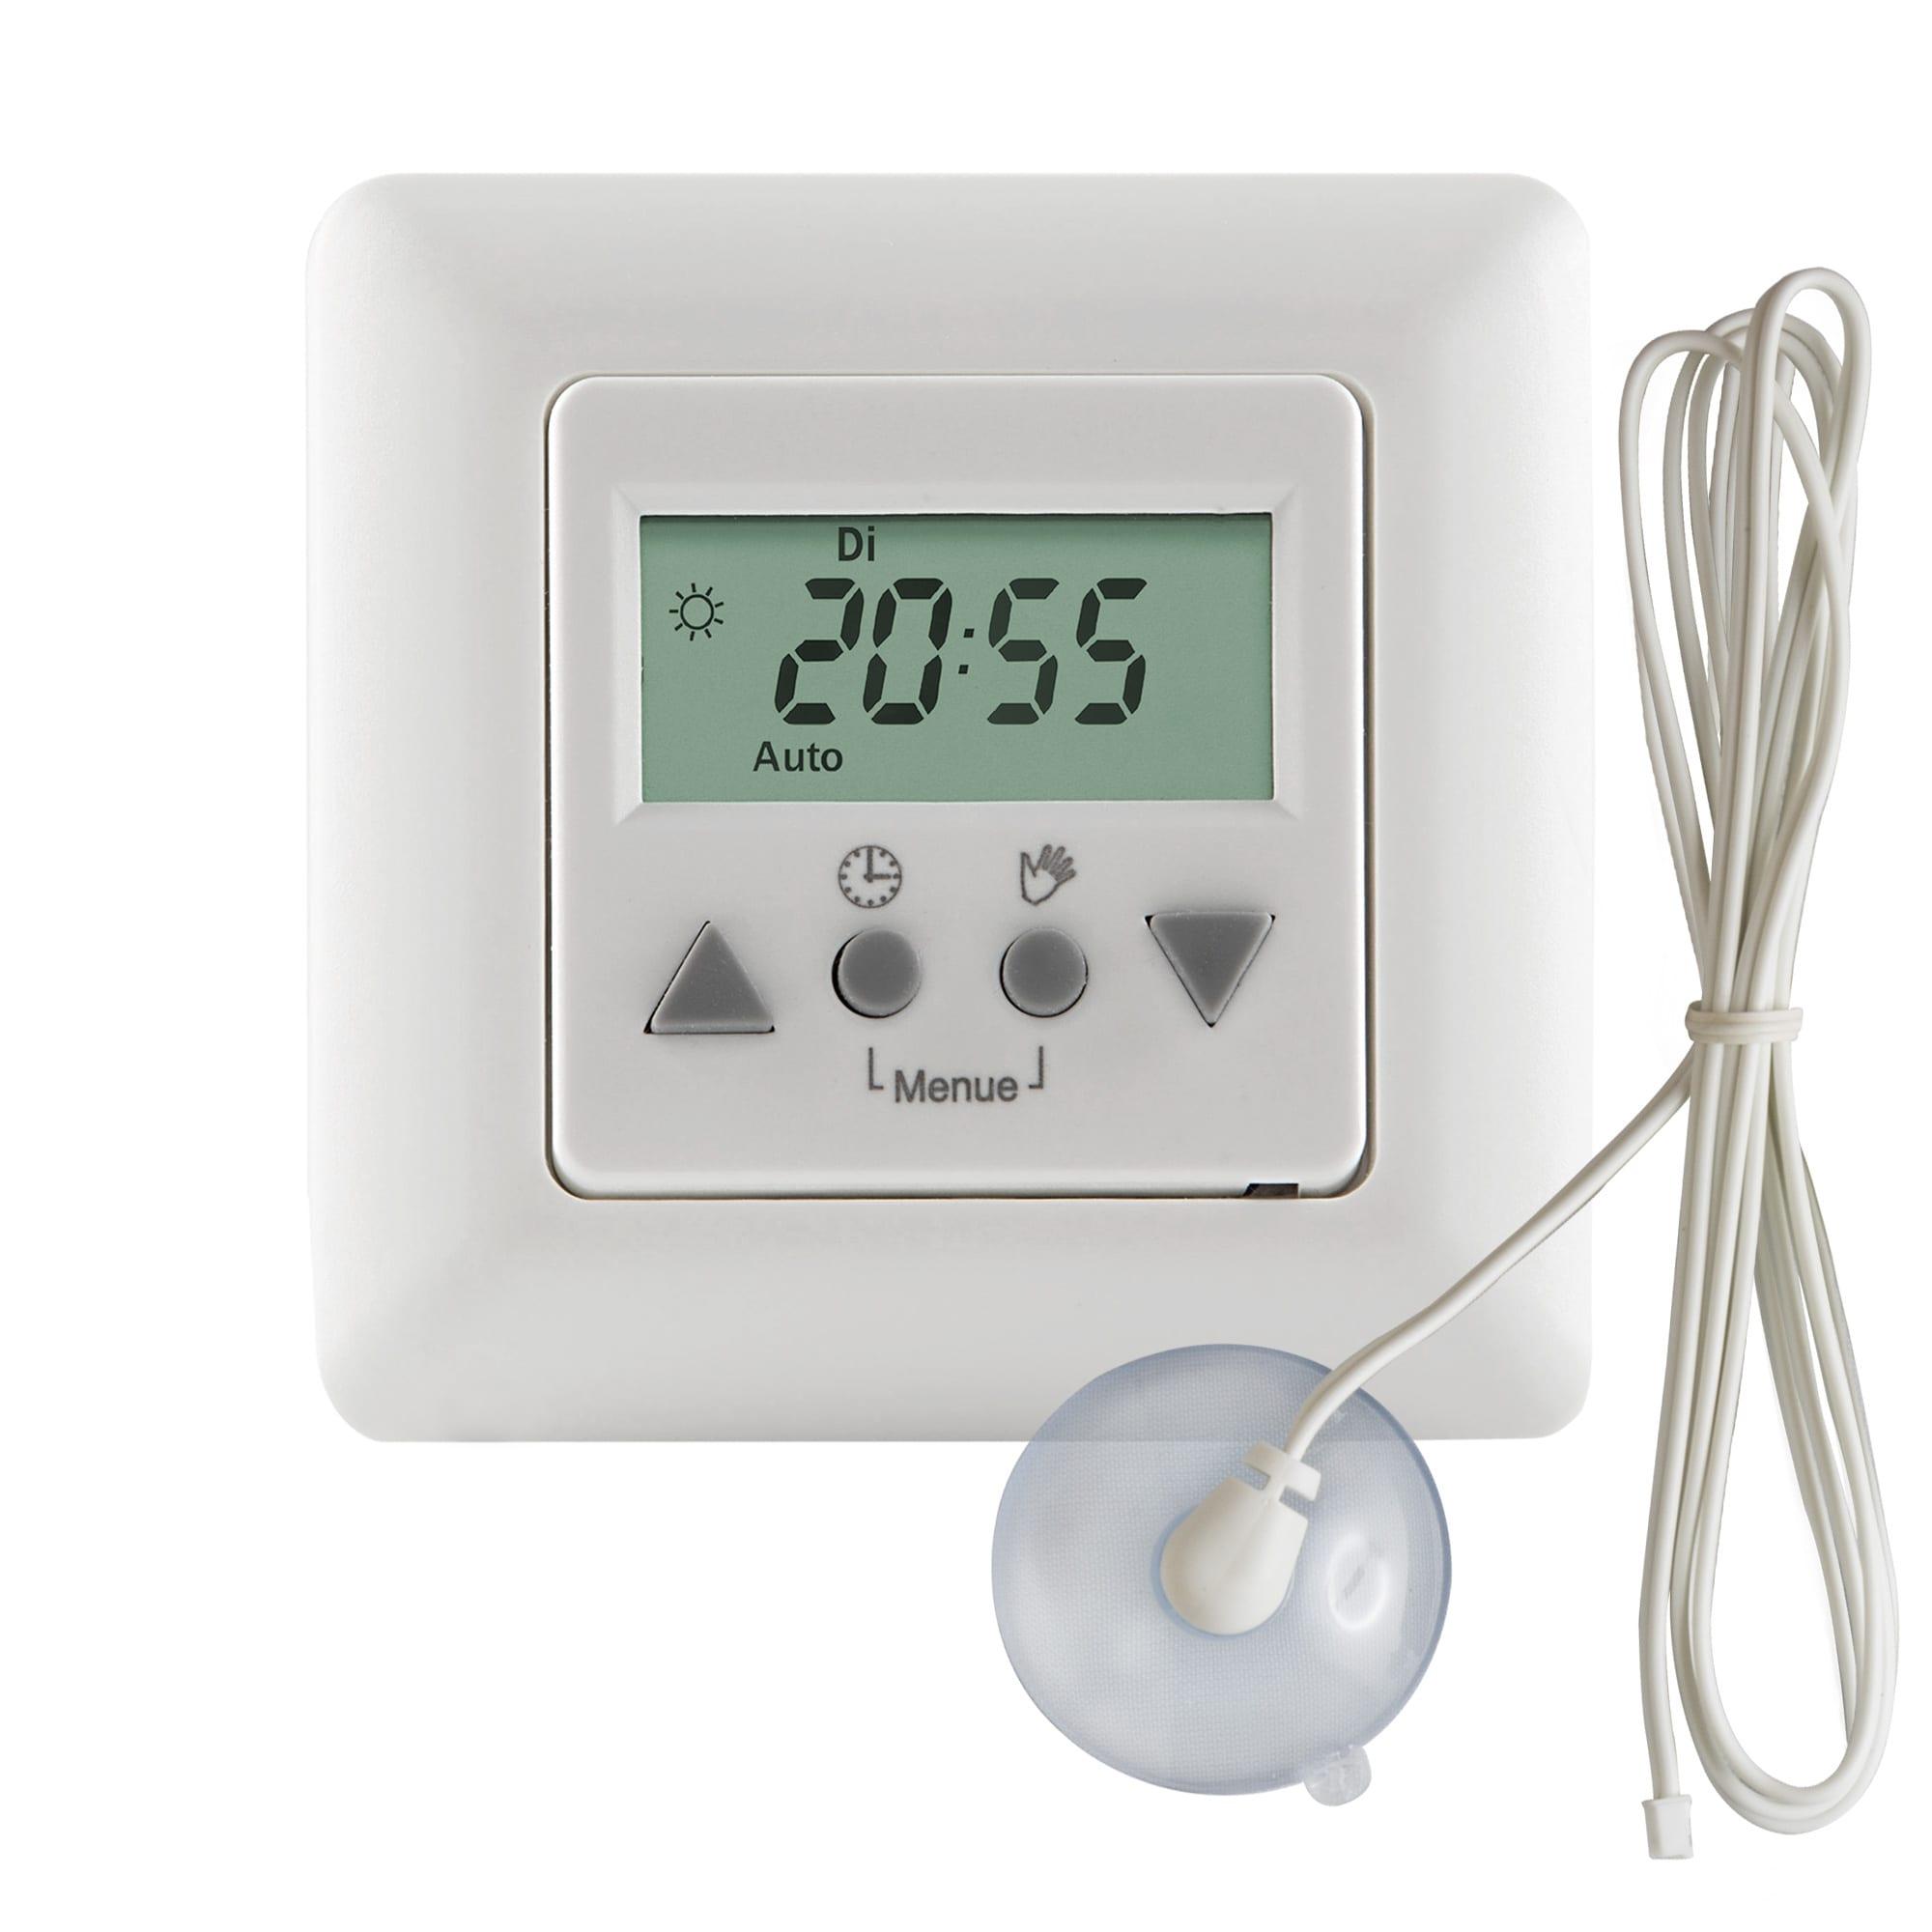 zeitschaltuhr jarolift multi time control 3m sensor eur 51 99 picclick de. Black Bedroom Furniture Sets. Home Design Ideas